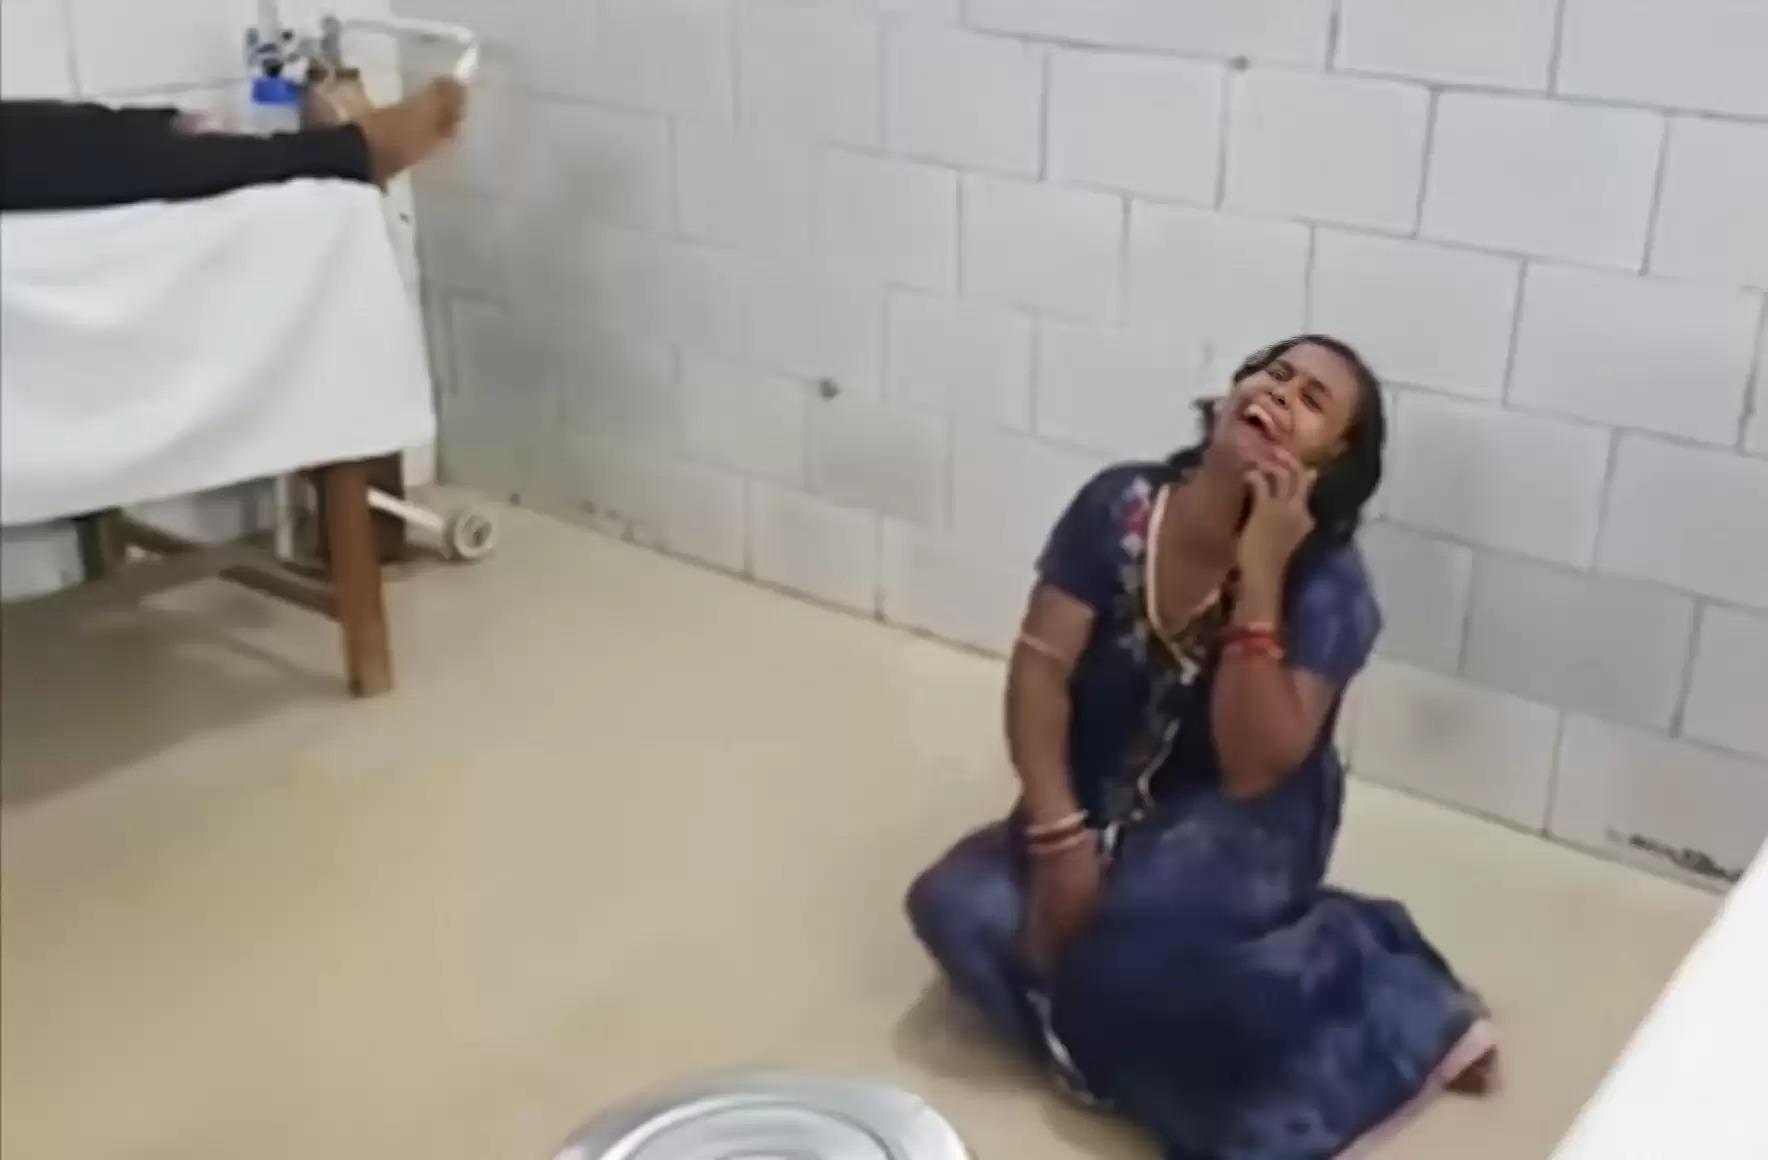 Victim mother